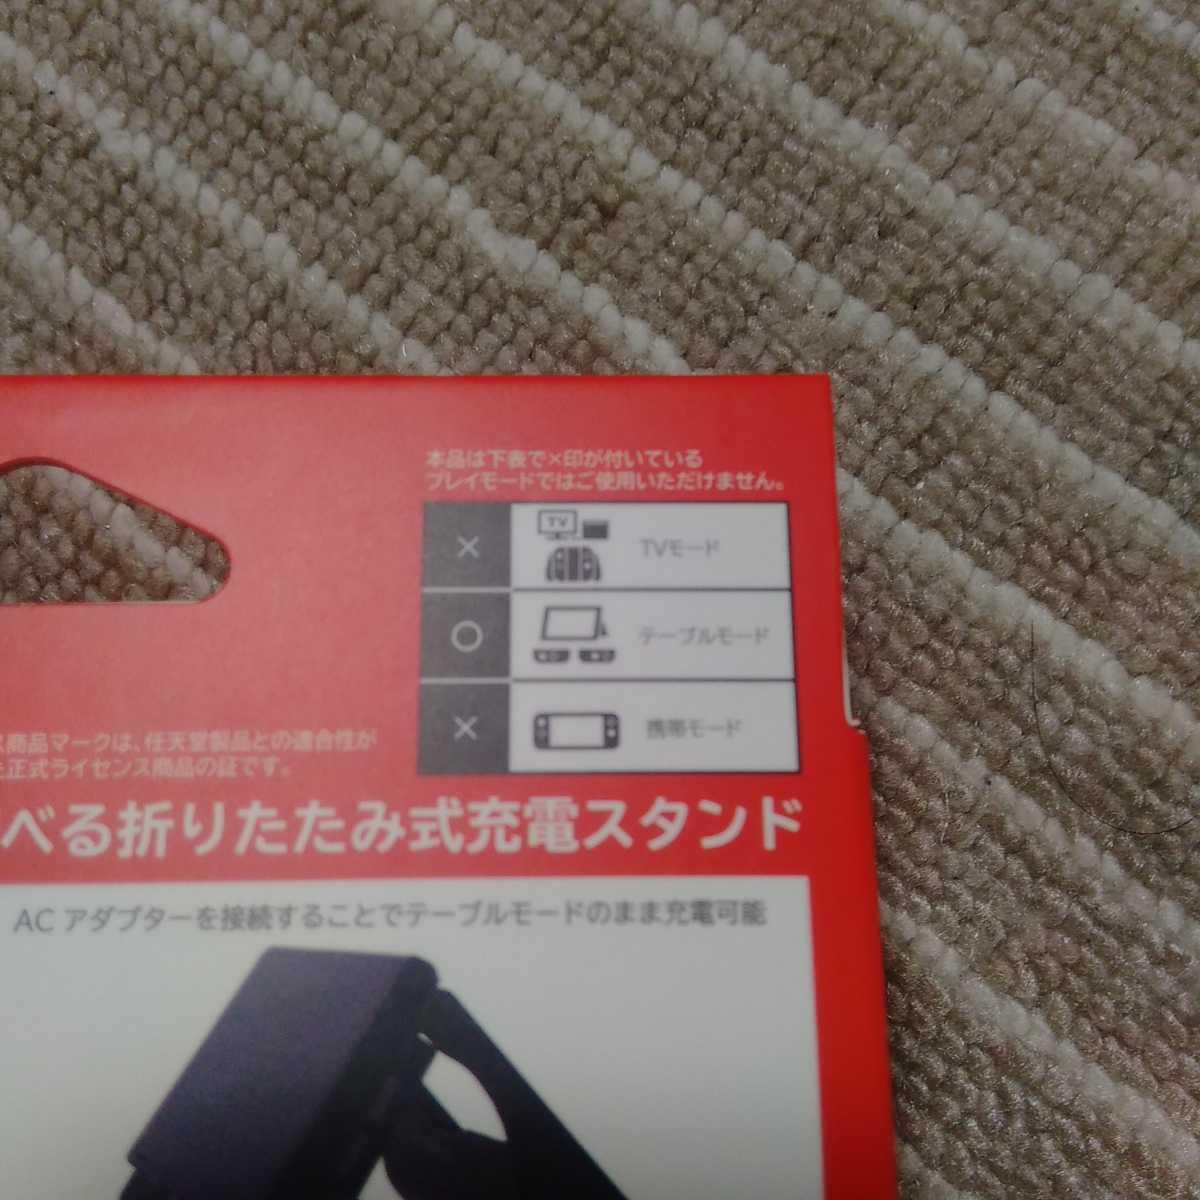 【Nintendo Switch対応】ポータブルUSBハブスタンド for Nintendo Switch (テーブルモード専用)